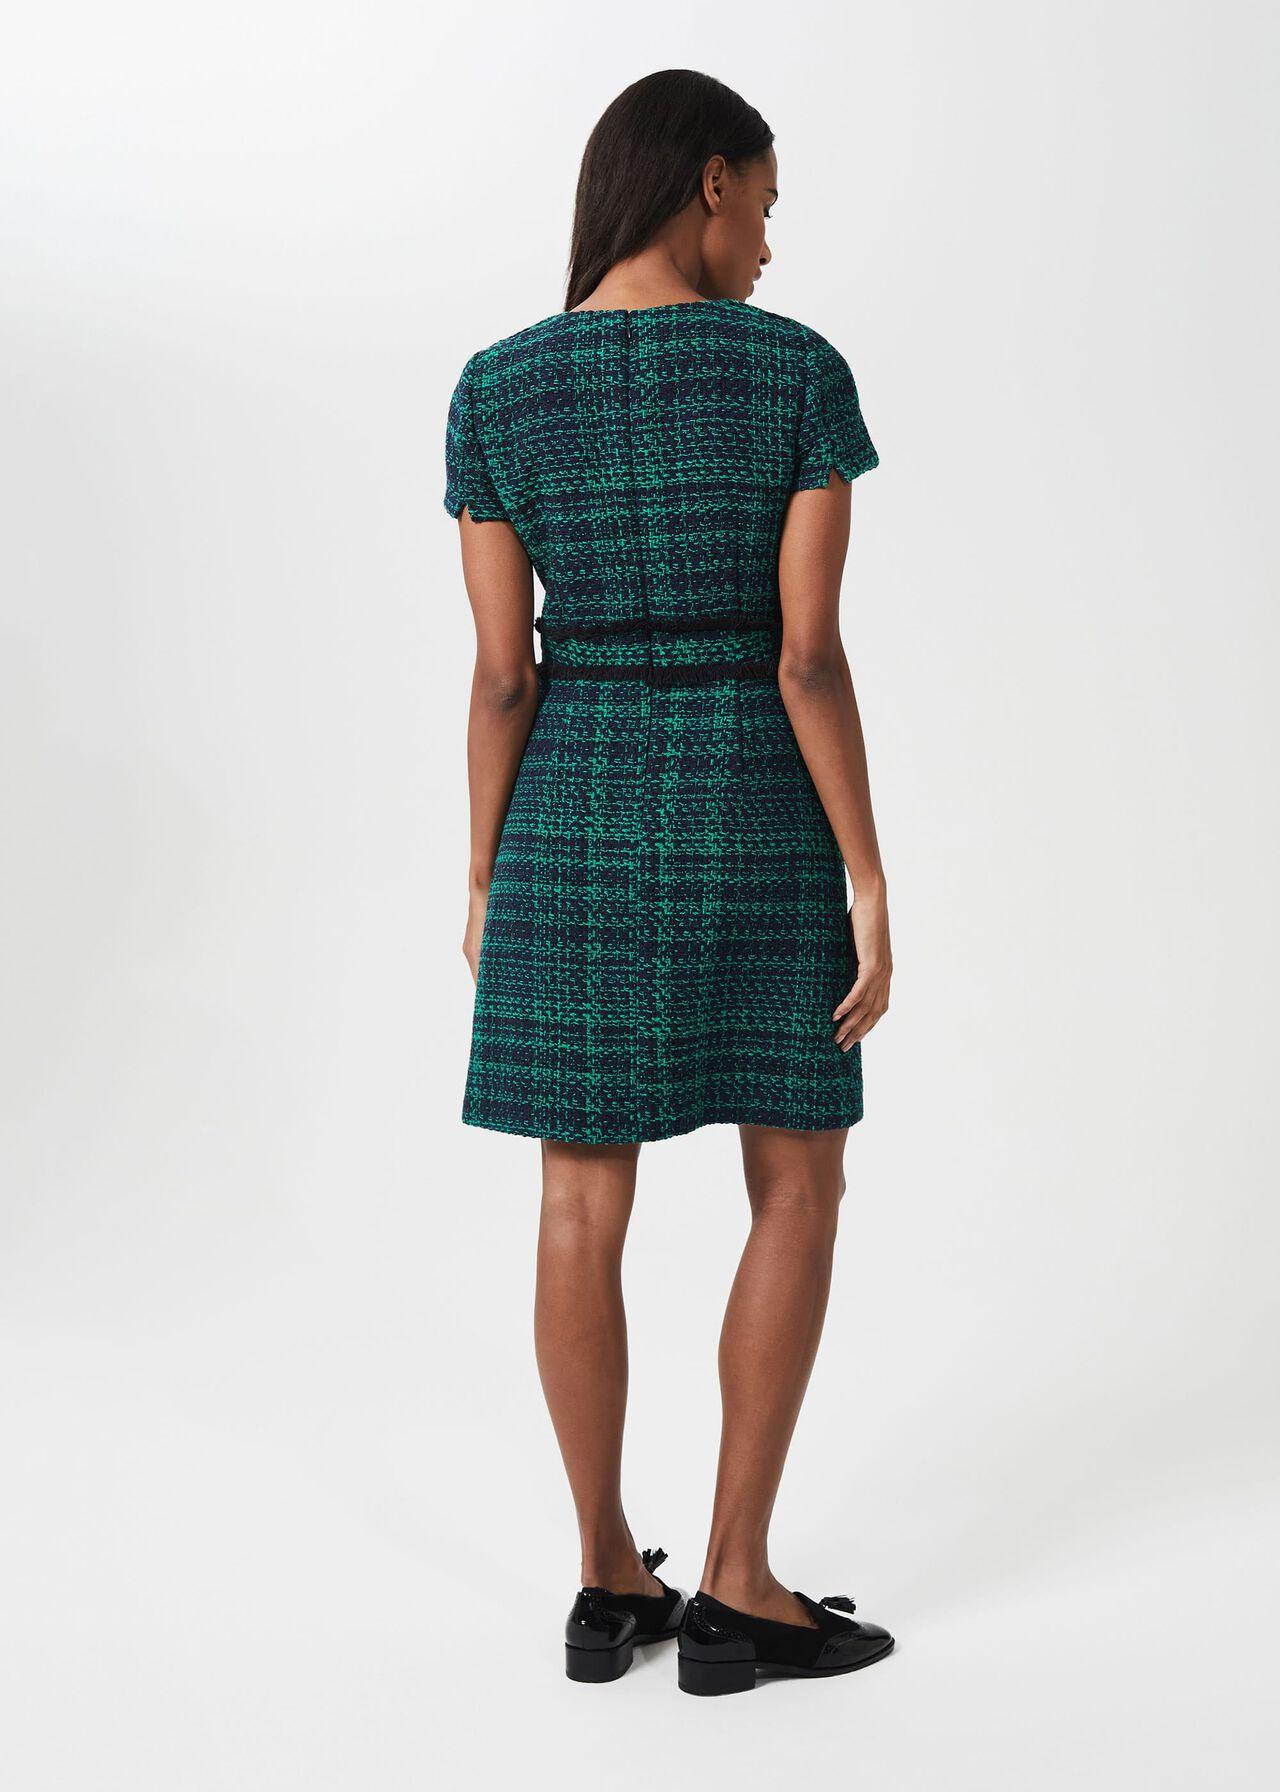 Rosa Tweed A Line Dress, Navy Apple Grn, hi-res